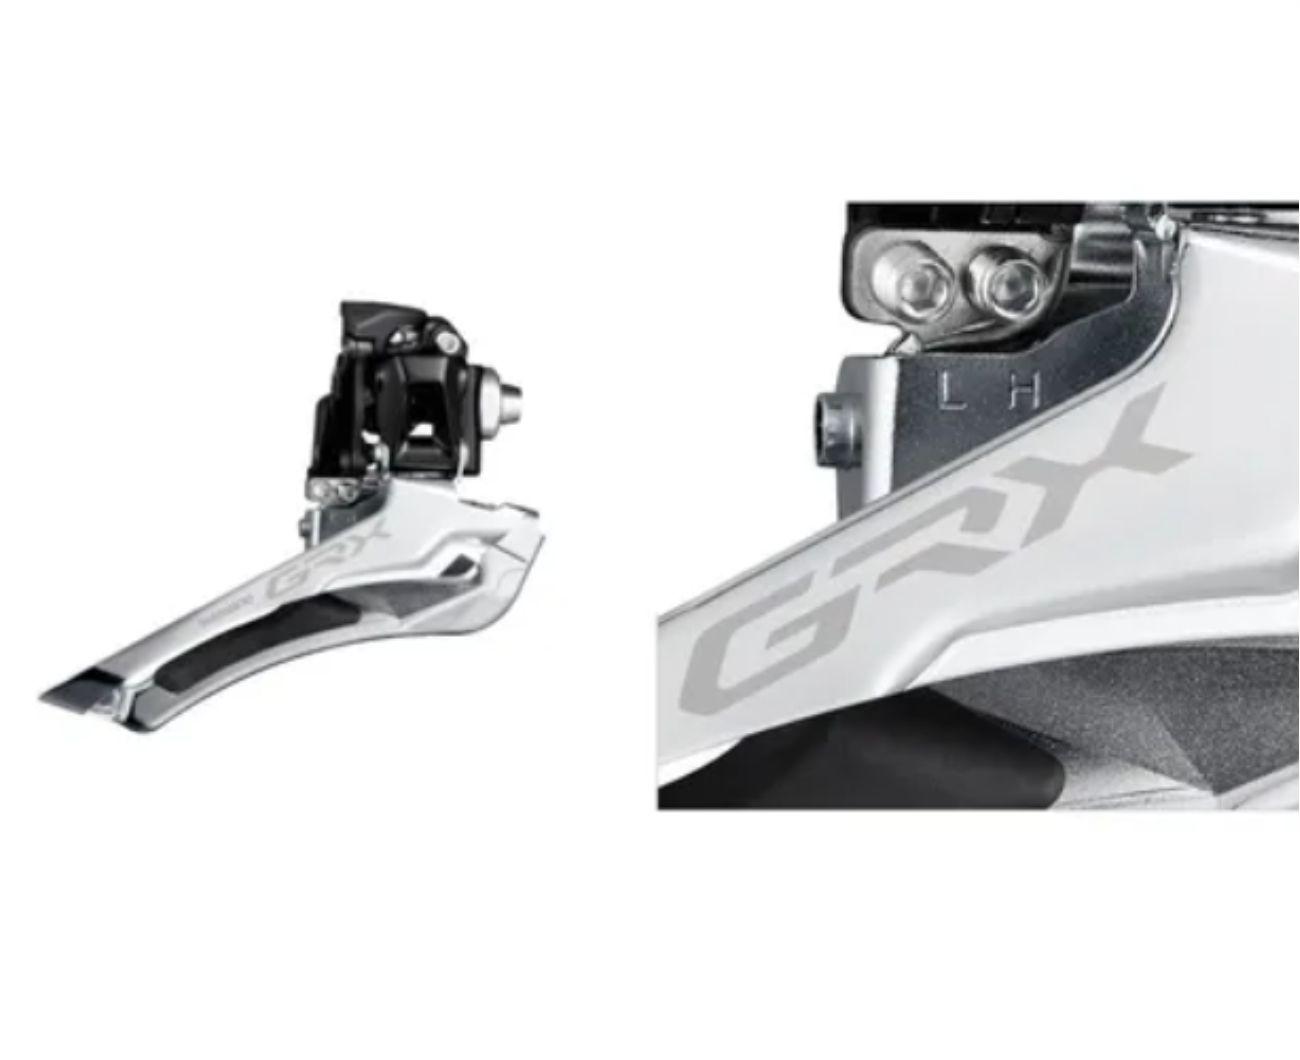 Câmbio Dianteiro Shimano Grx Rx400 2x10v Brazed On